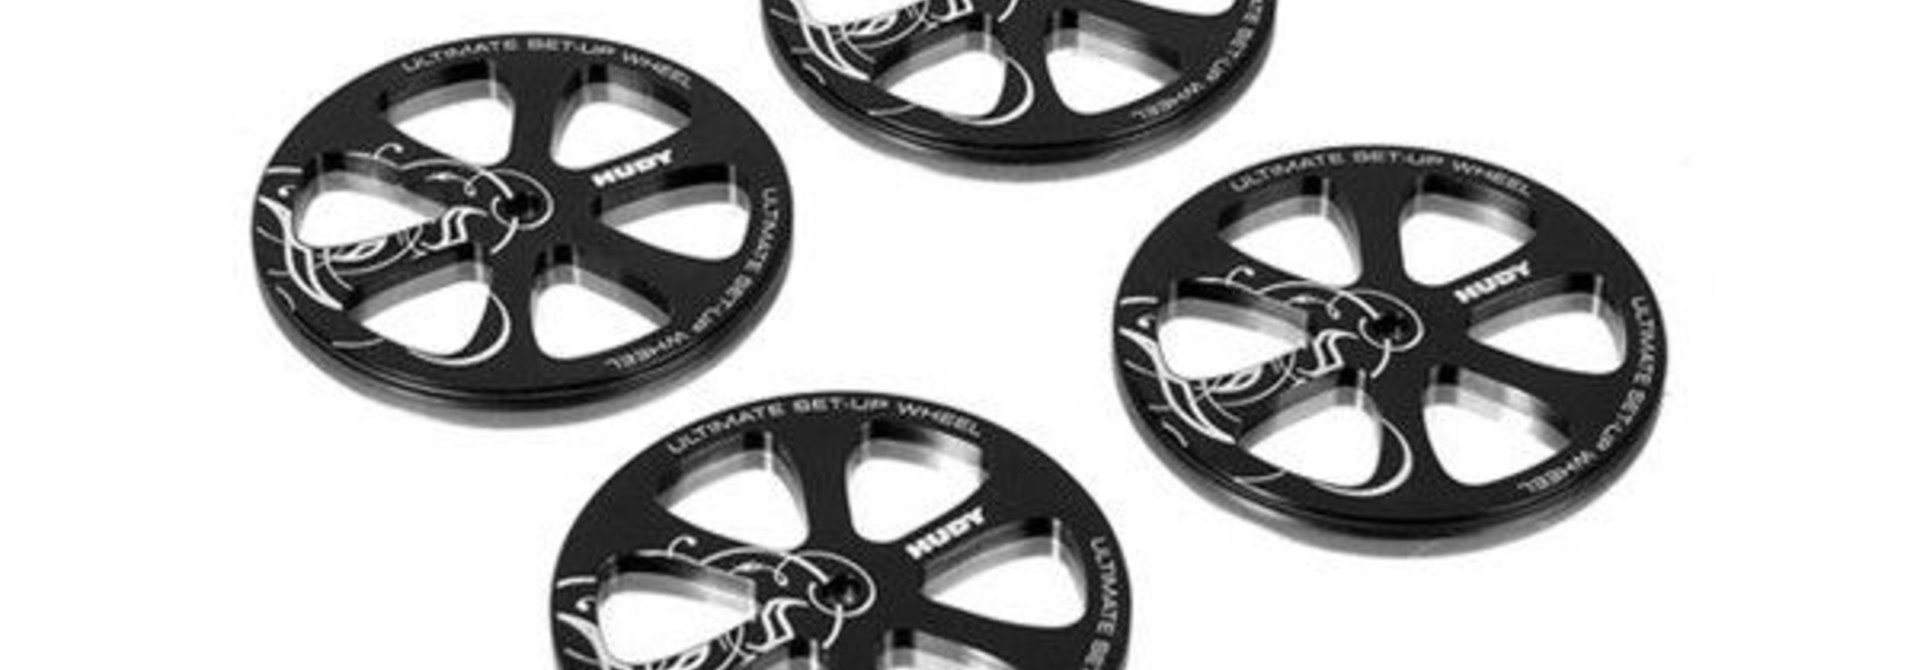 Alu Set-Up Wheel For 1/10 Rubber Tires (4), H109370